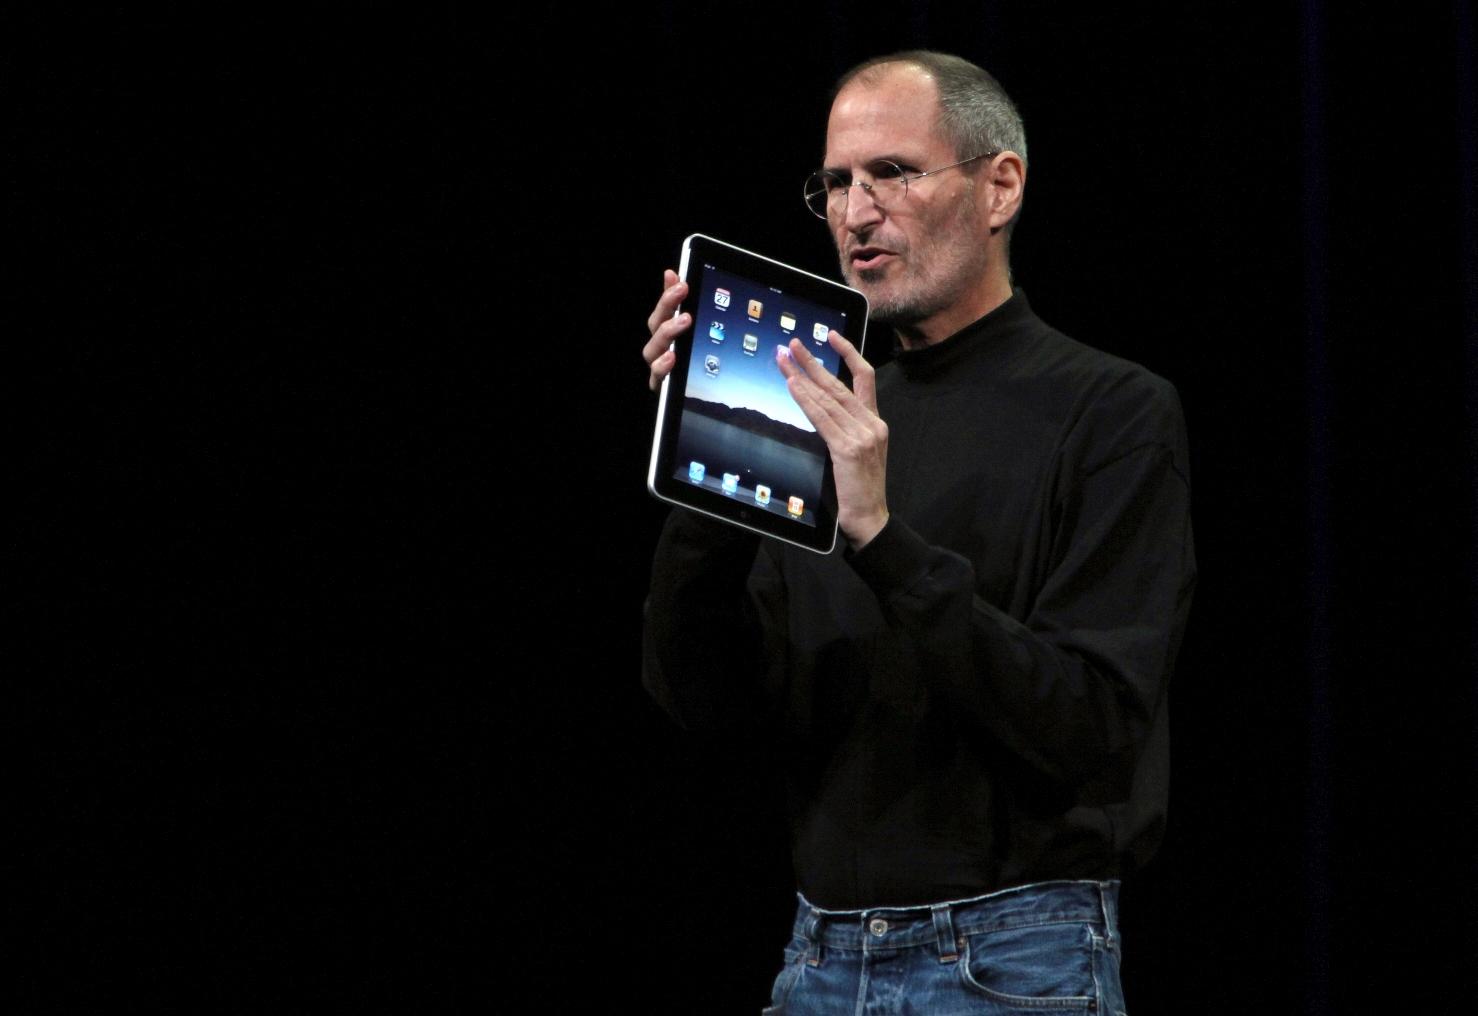 H ζωή του Steve Jobs στην μεγάλη οθόνη